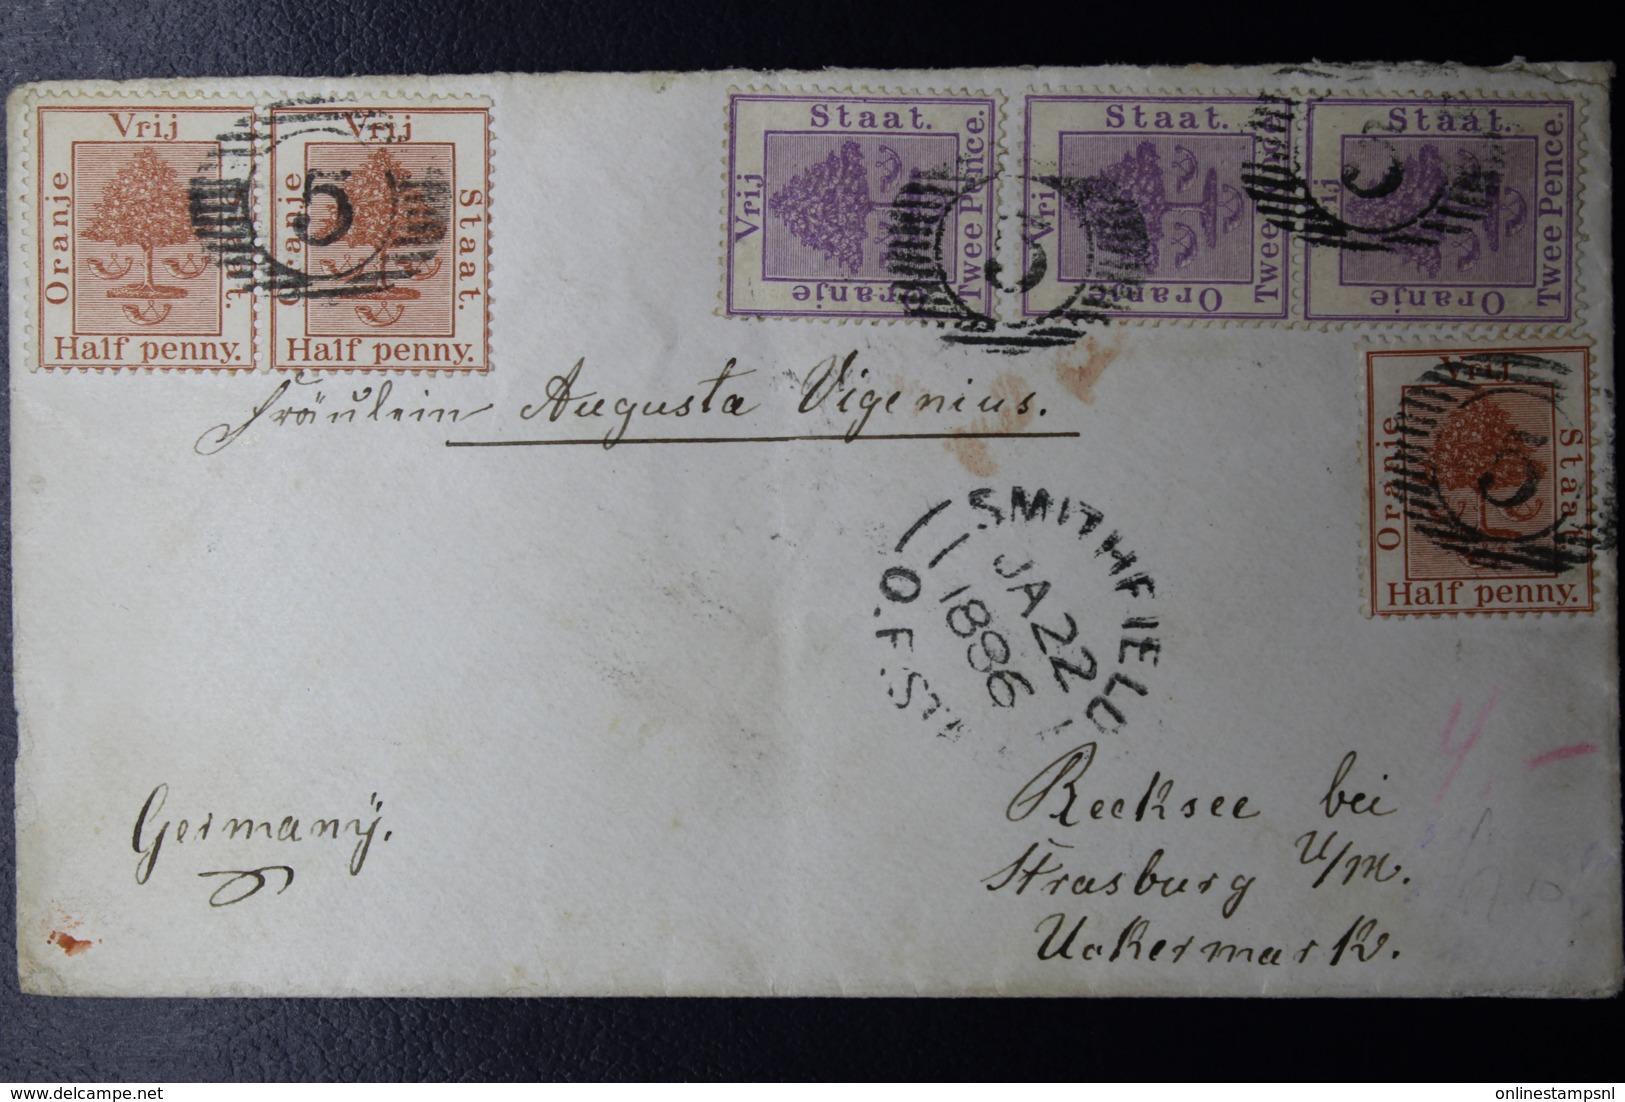 ORANGE FREE STATE COVER BETHLEHEM -> FRANKFURT GERMANY 13-8-1899 STRIP OF 3  SG 68 - Stato Libero Dell'Orange (1868-1909)